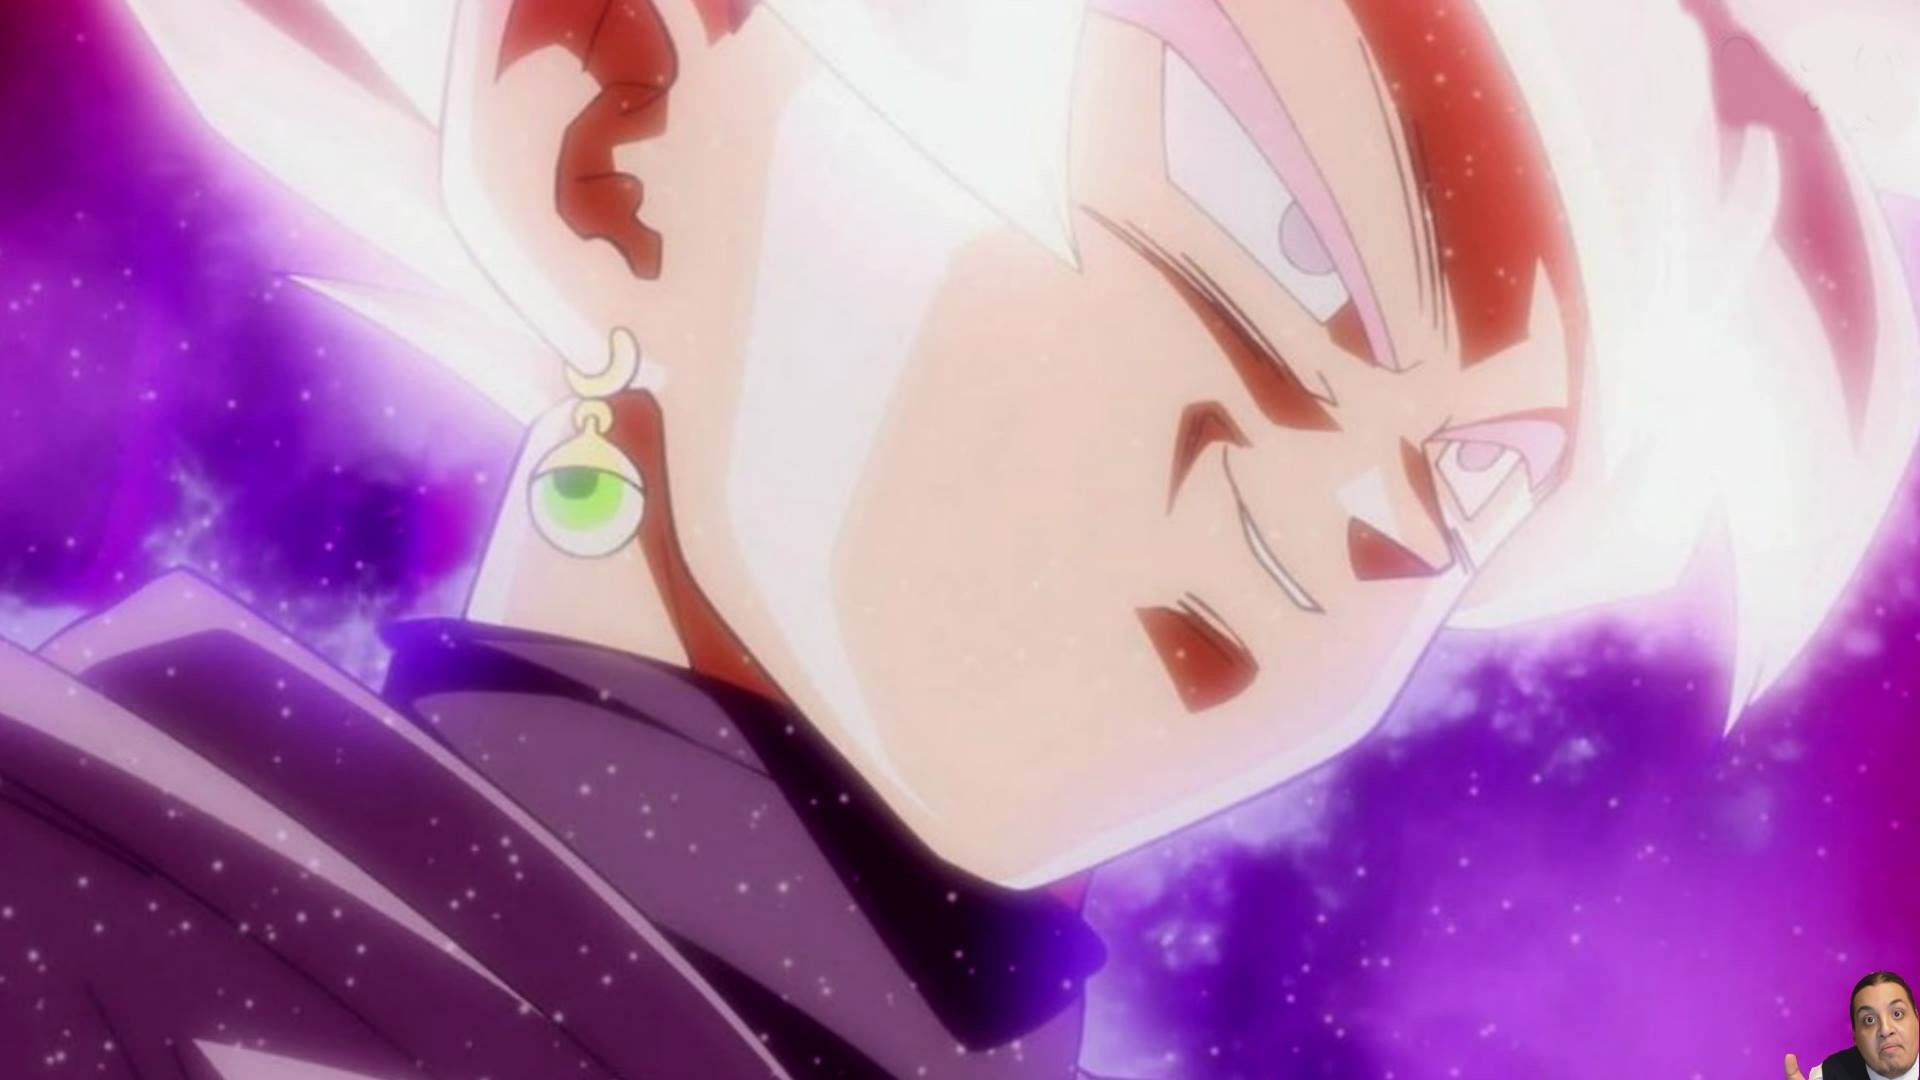 goku rose wallpaper dragon ball super